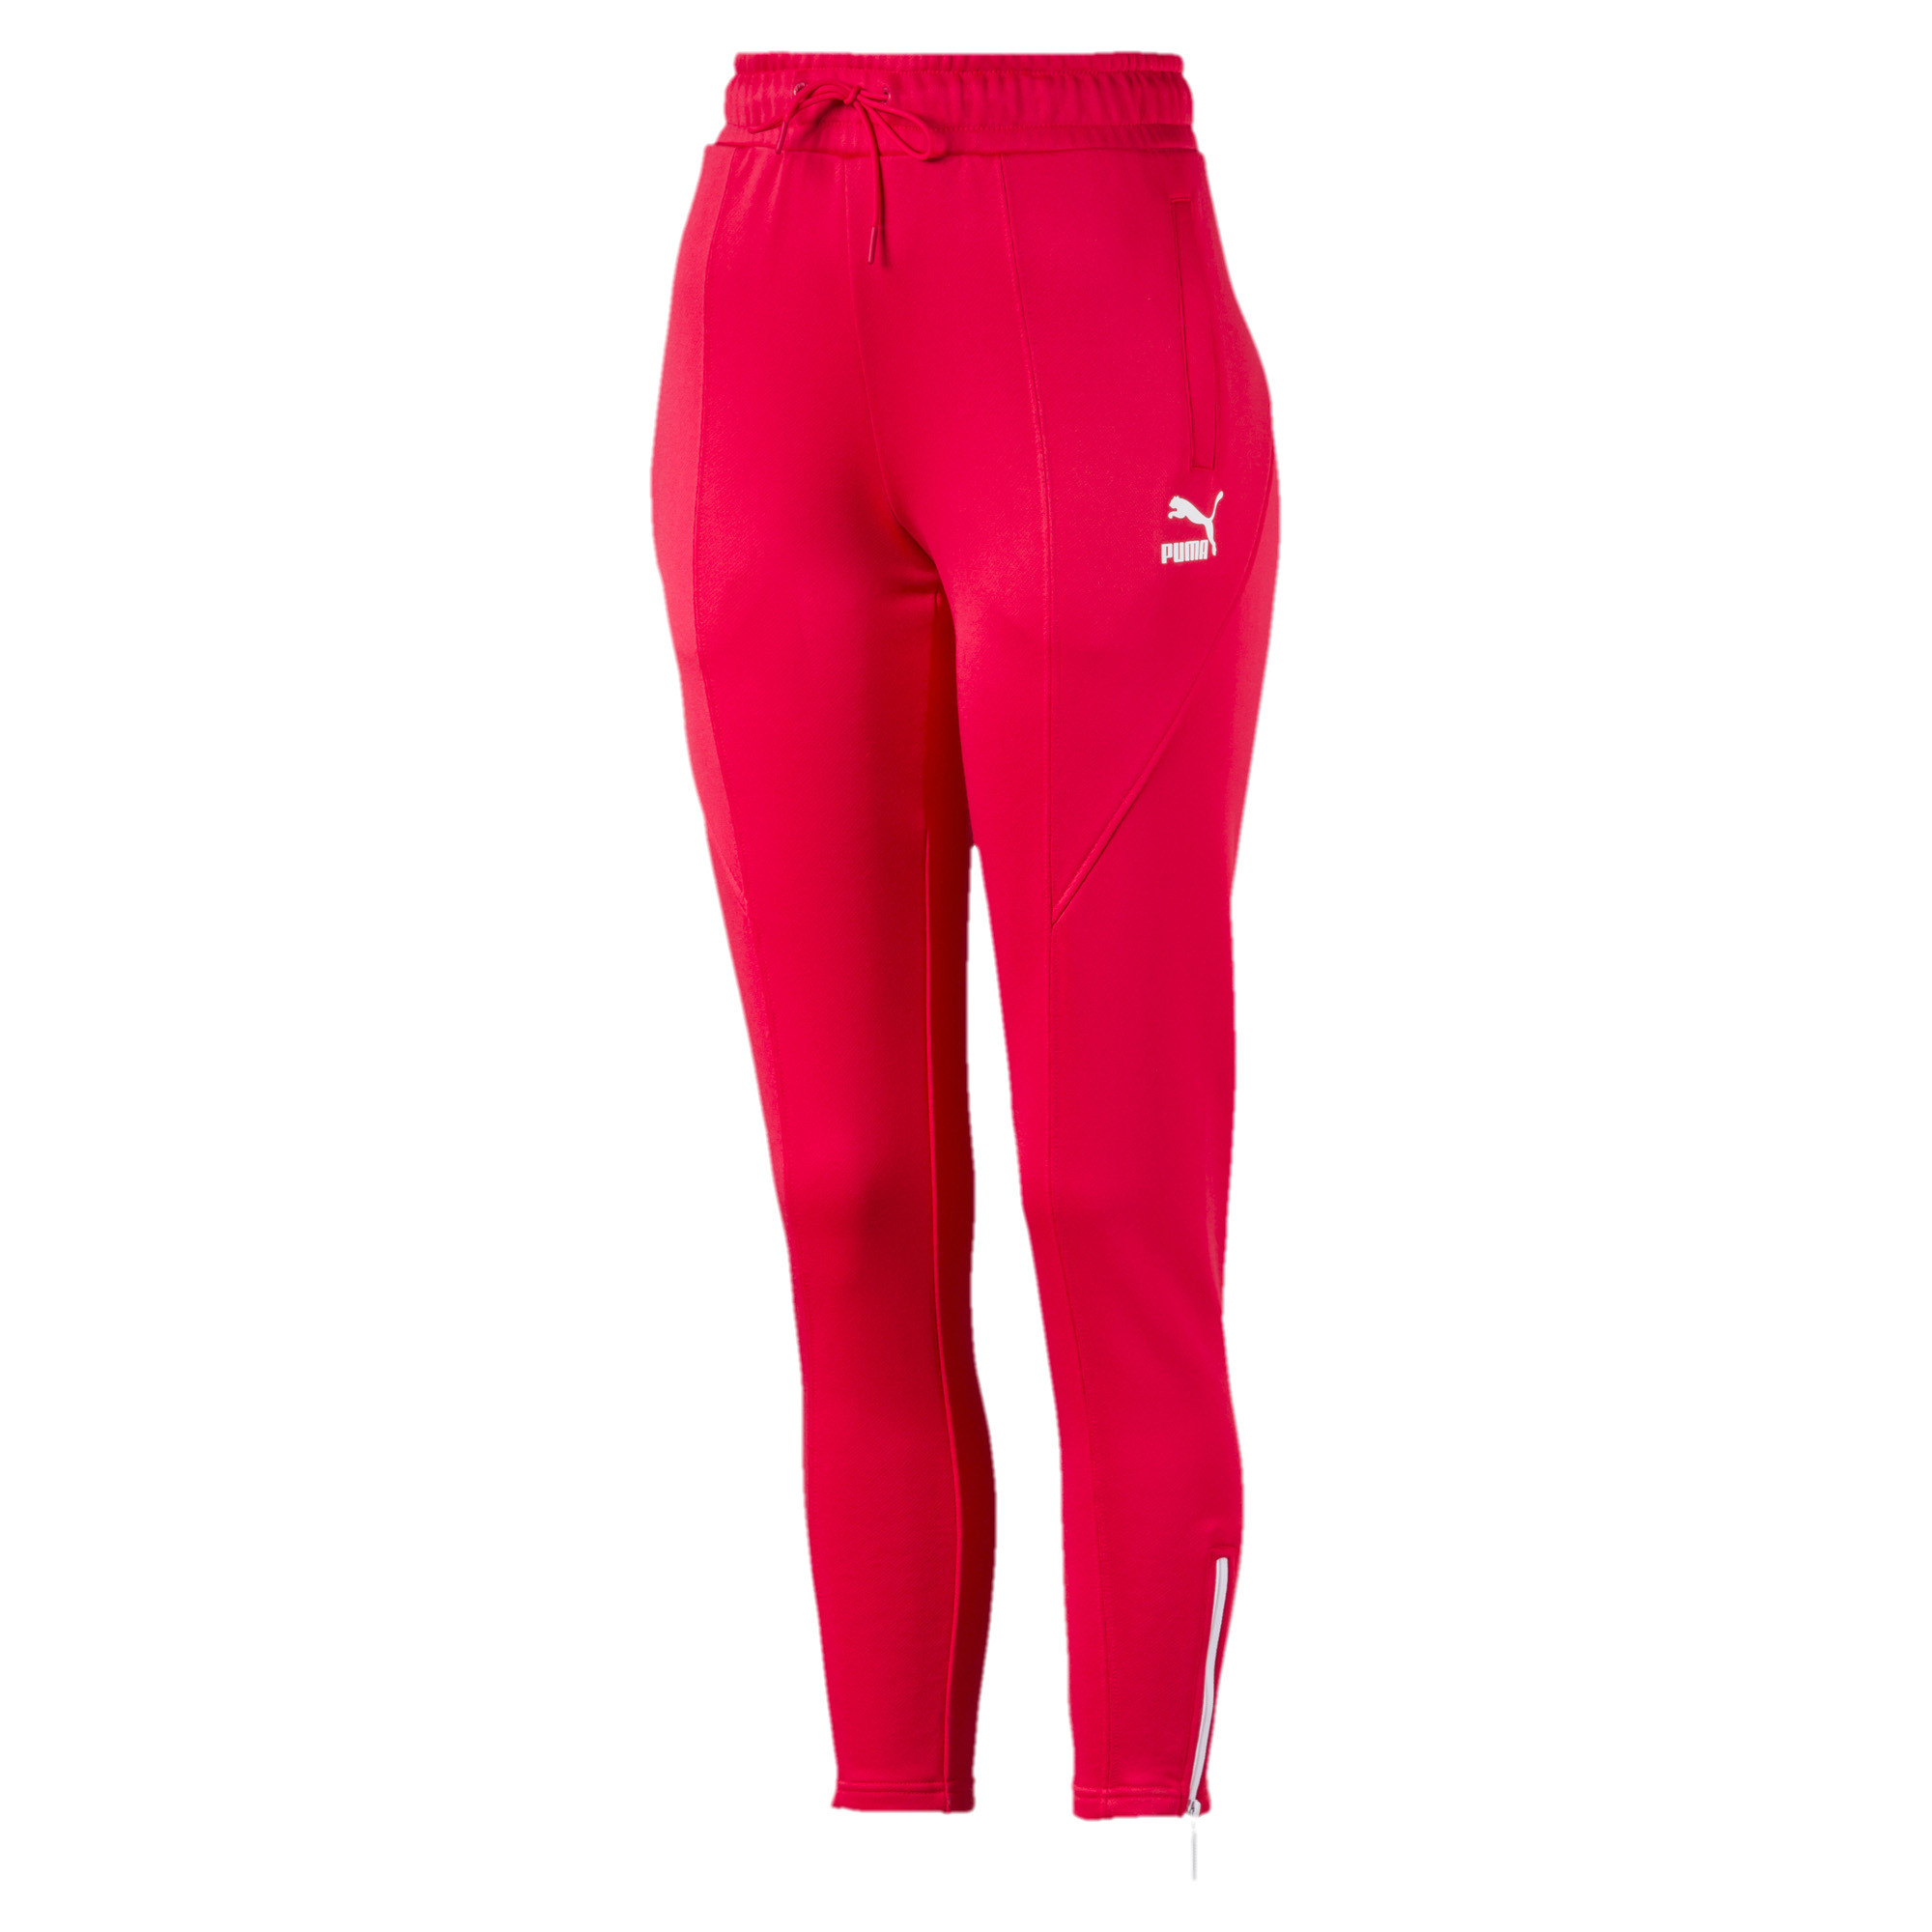 e0e2c38c69c929 Pants & Tights - Clothing - Womens